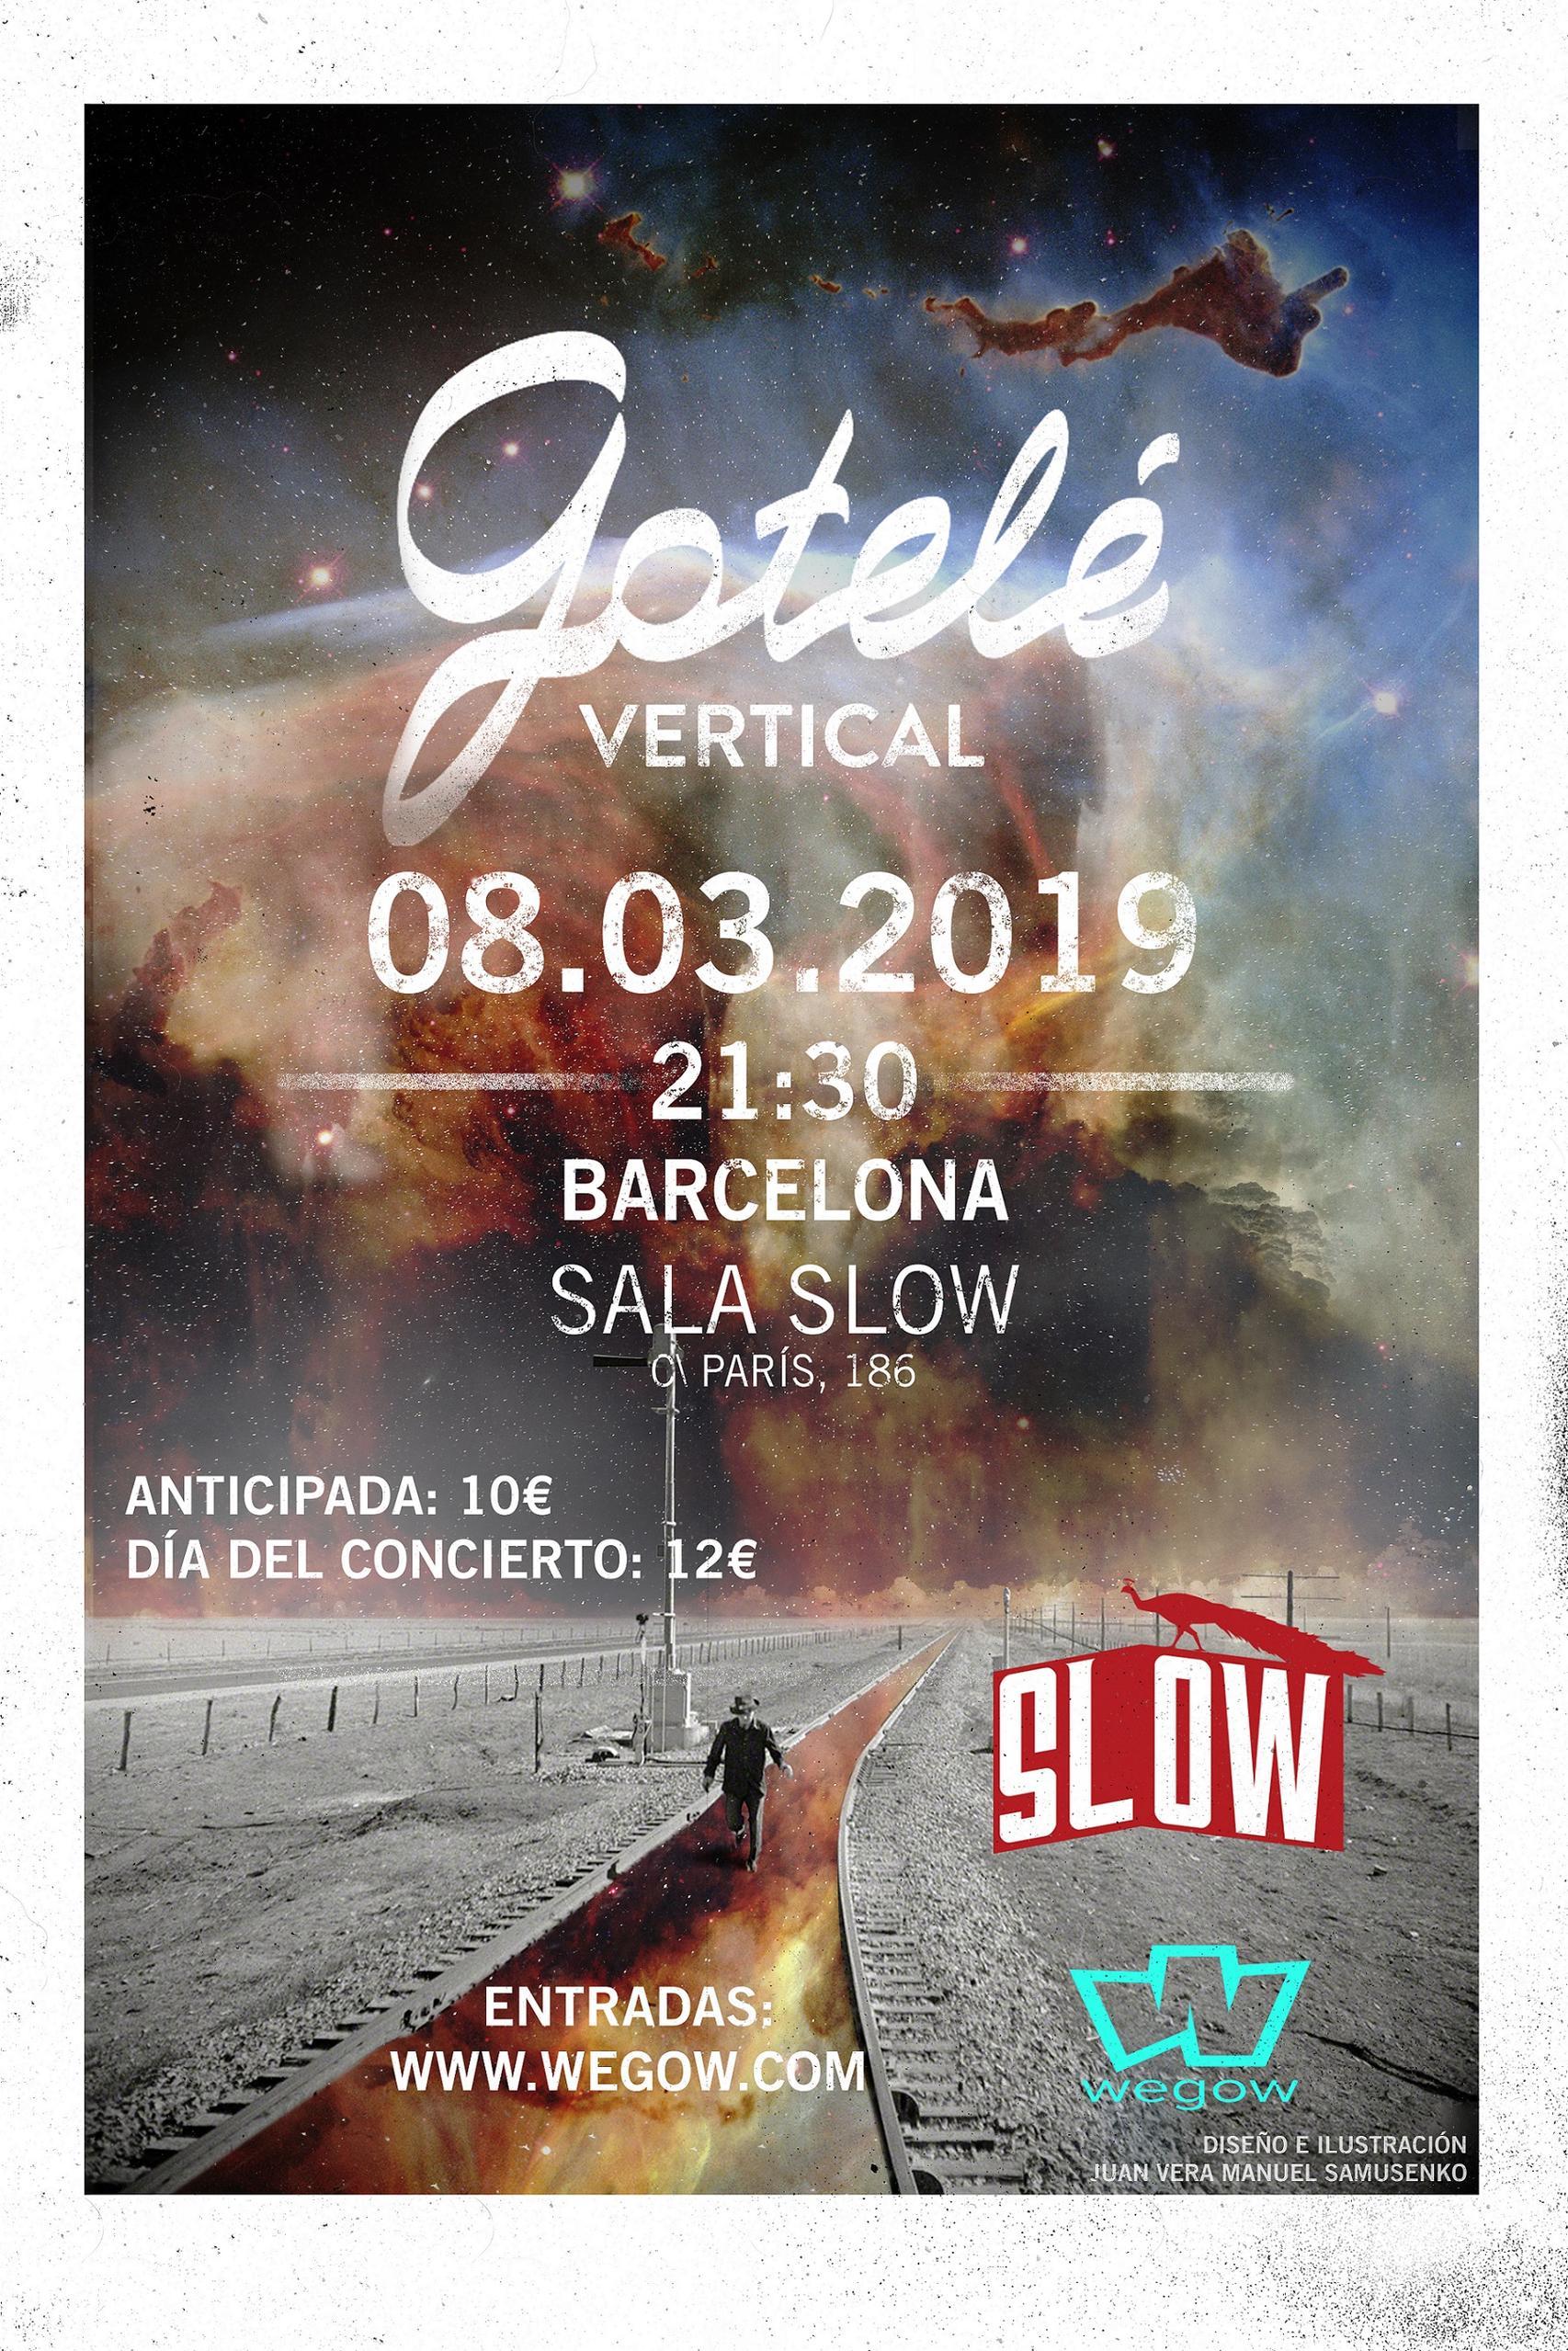 Día: 08/03/2019 Hora: 21:30 Sala Slow (C/Paros, 186; Barcelona) Entrada anticipada: 10€ Entrada taquilla: 12€